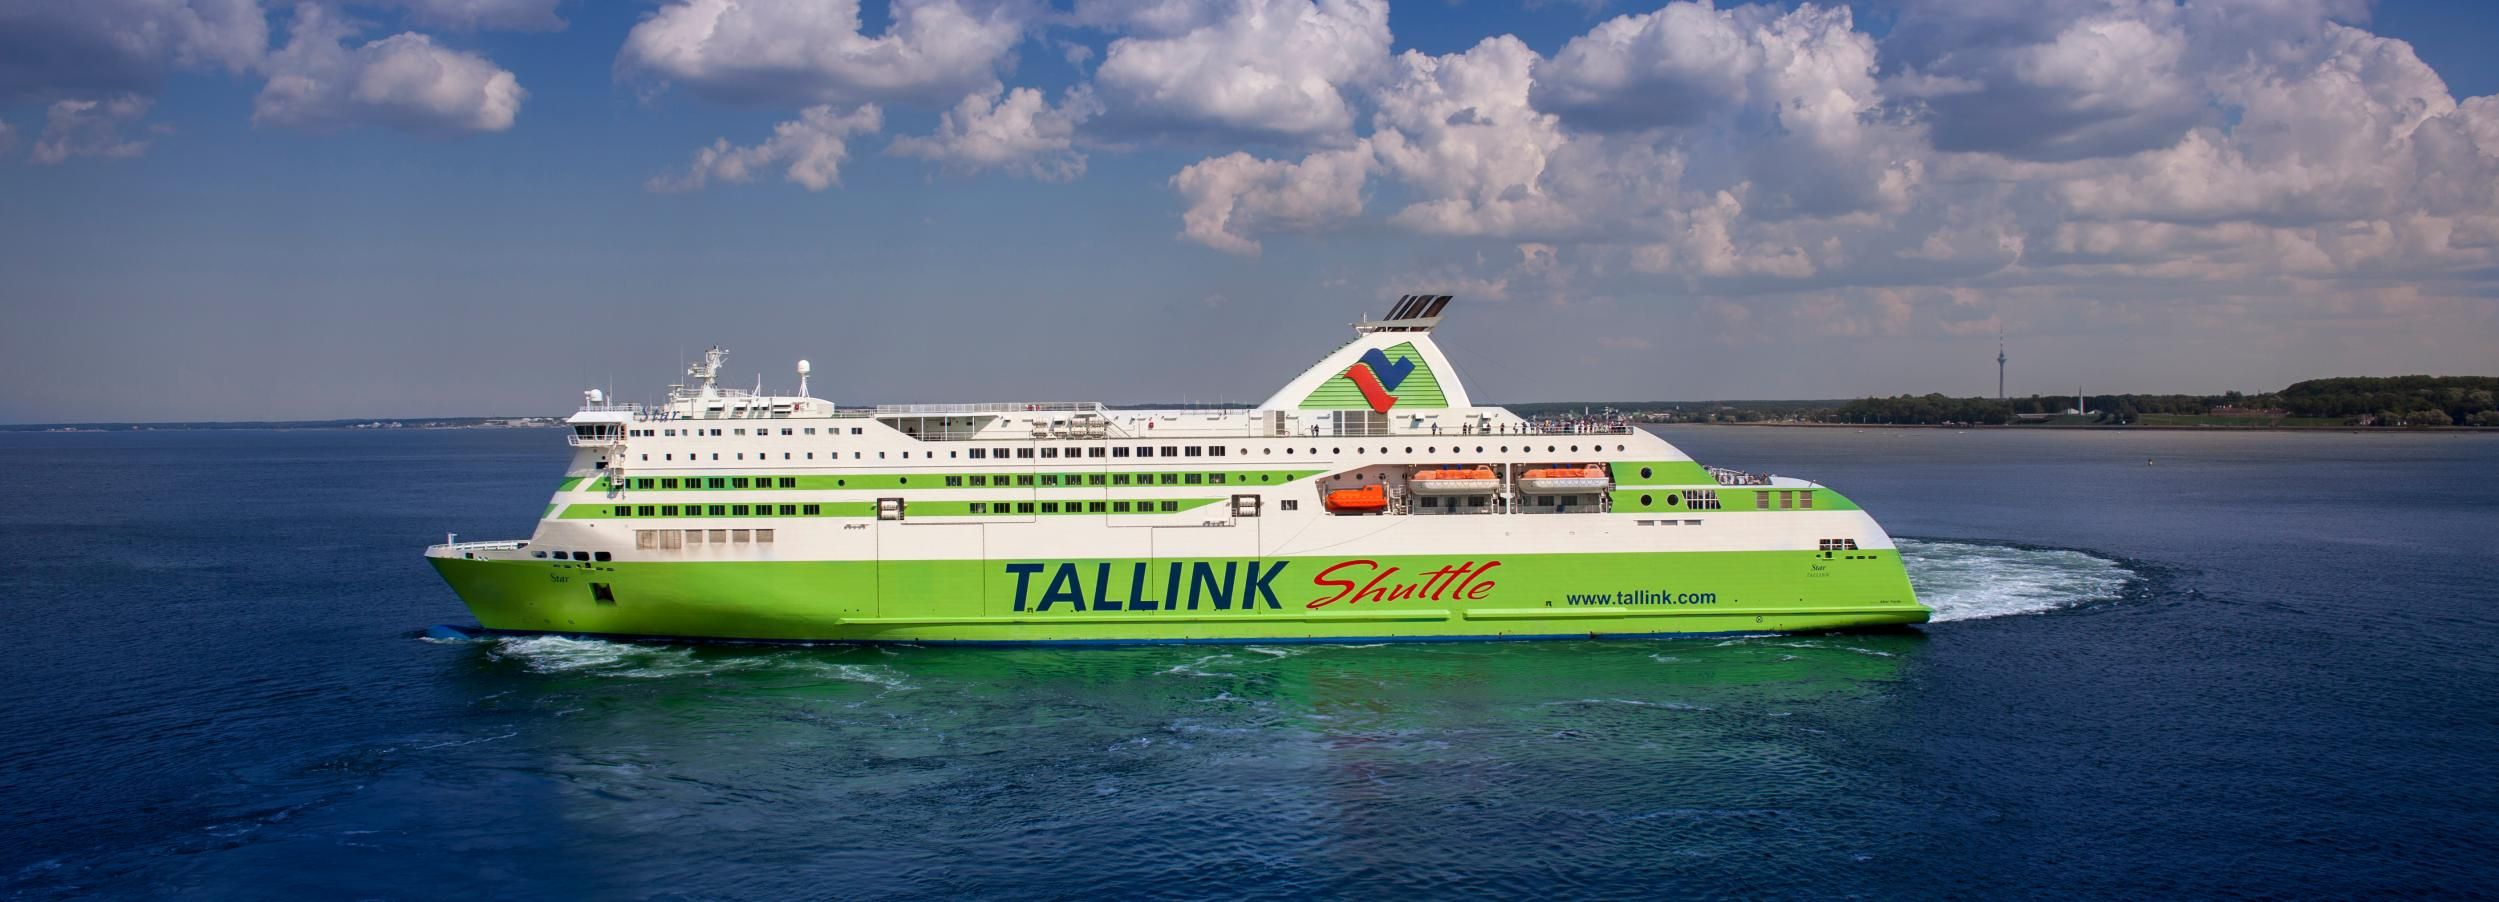 From Helsinki: Return Day Trip Ferry Ticket to Tallinn